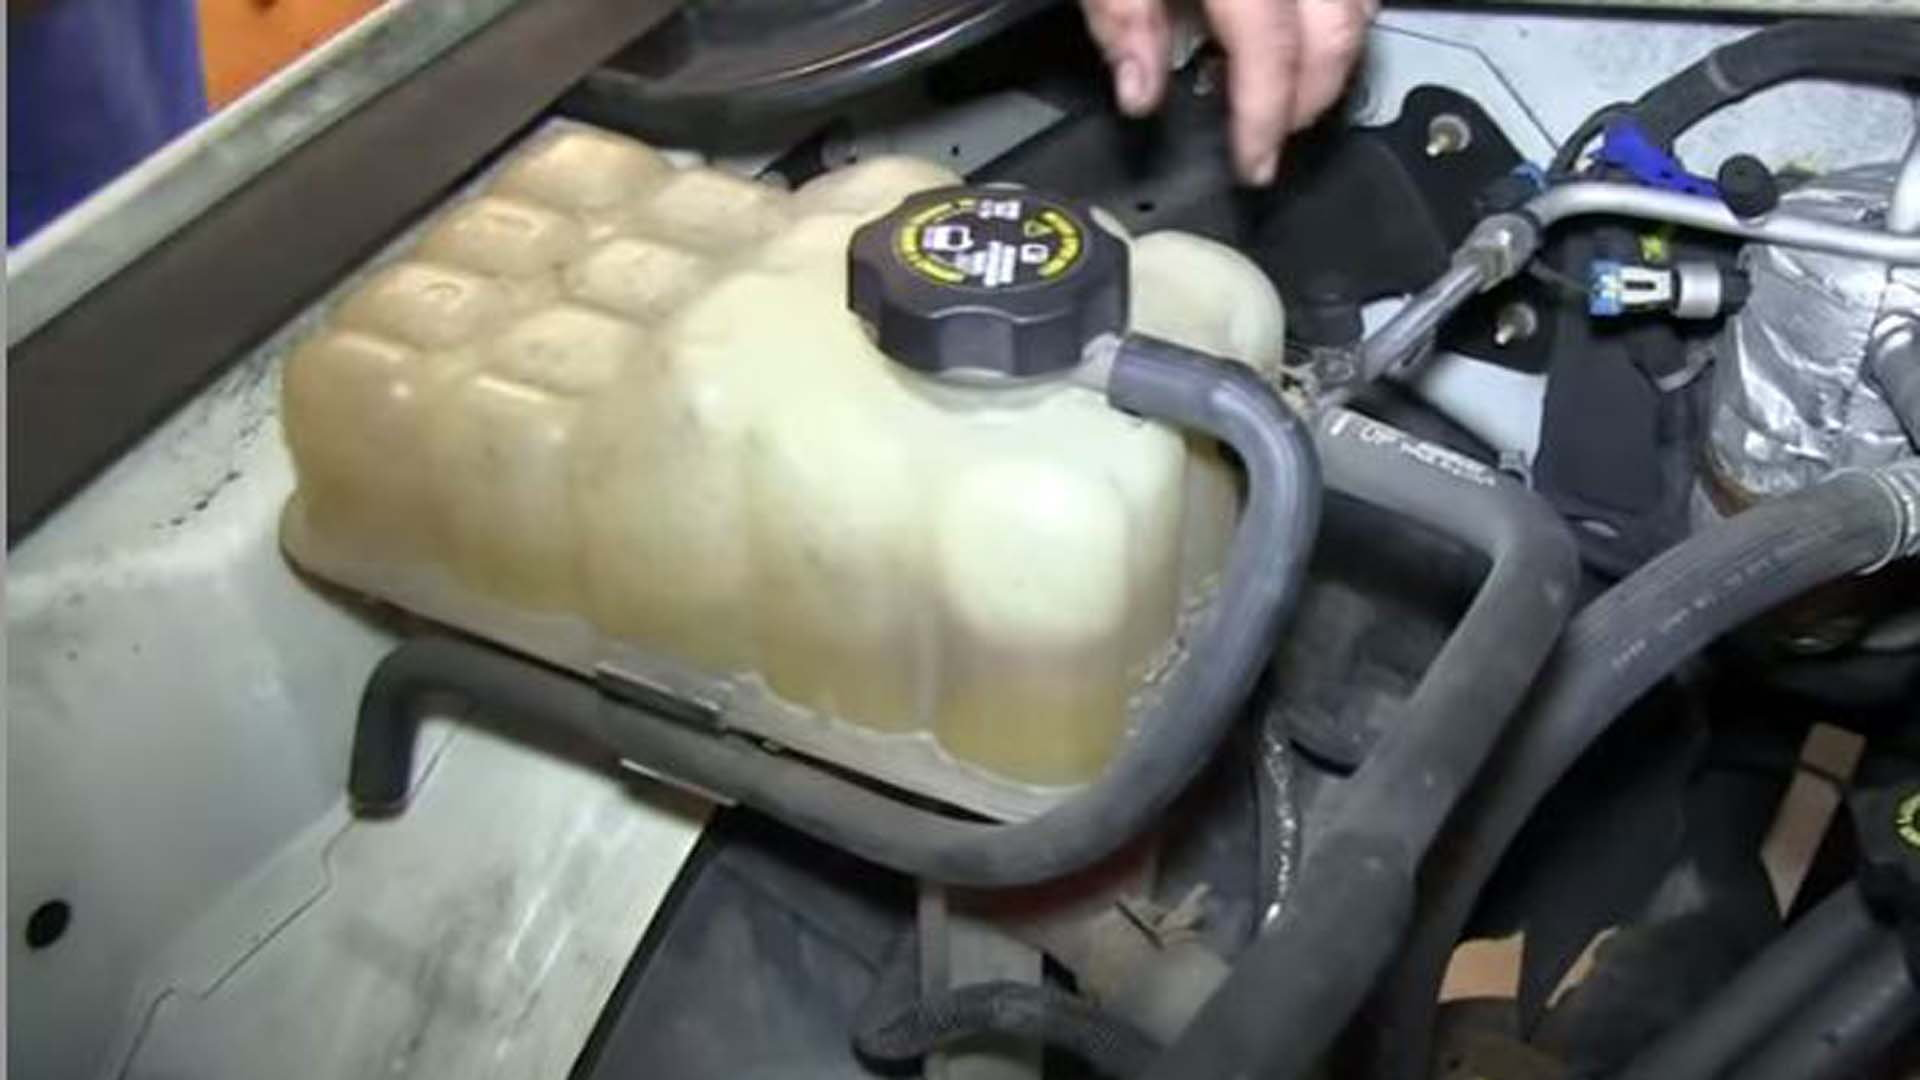 New Radiator Coolant Overflow Tank Bottle With Cap For Silverado Gm Sierra